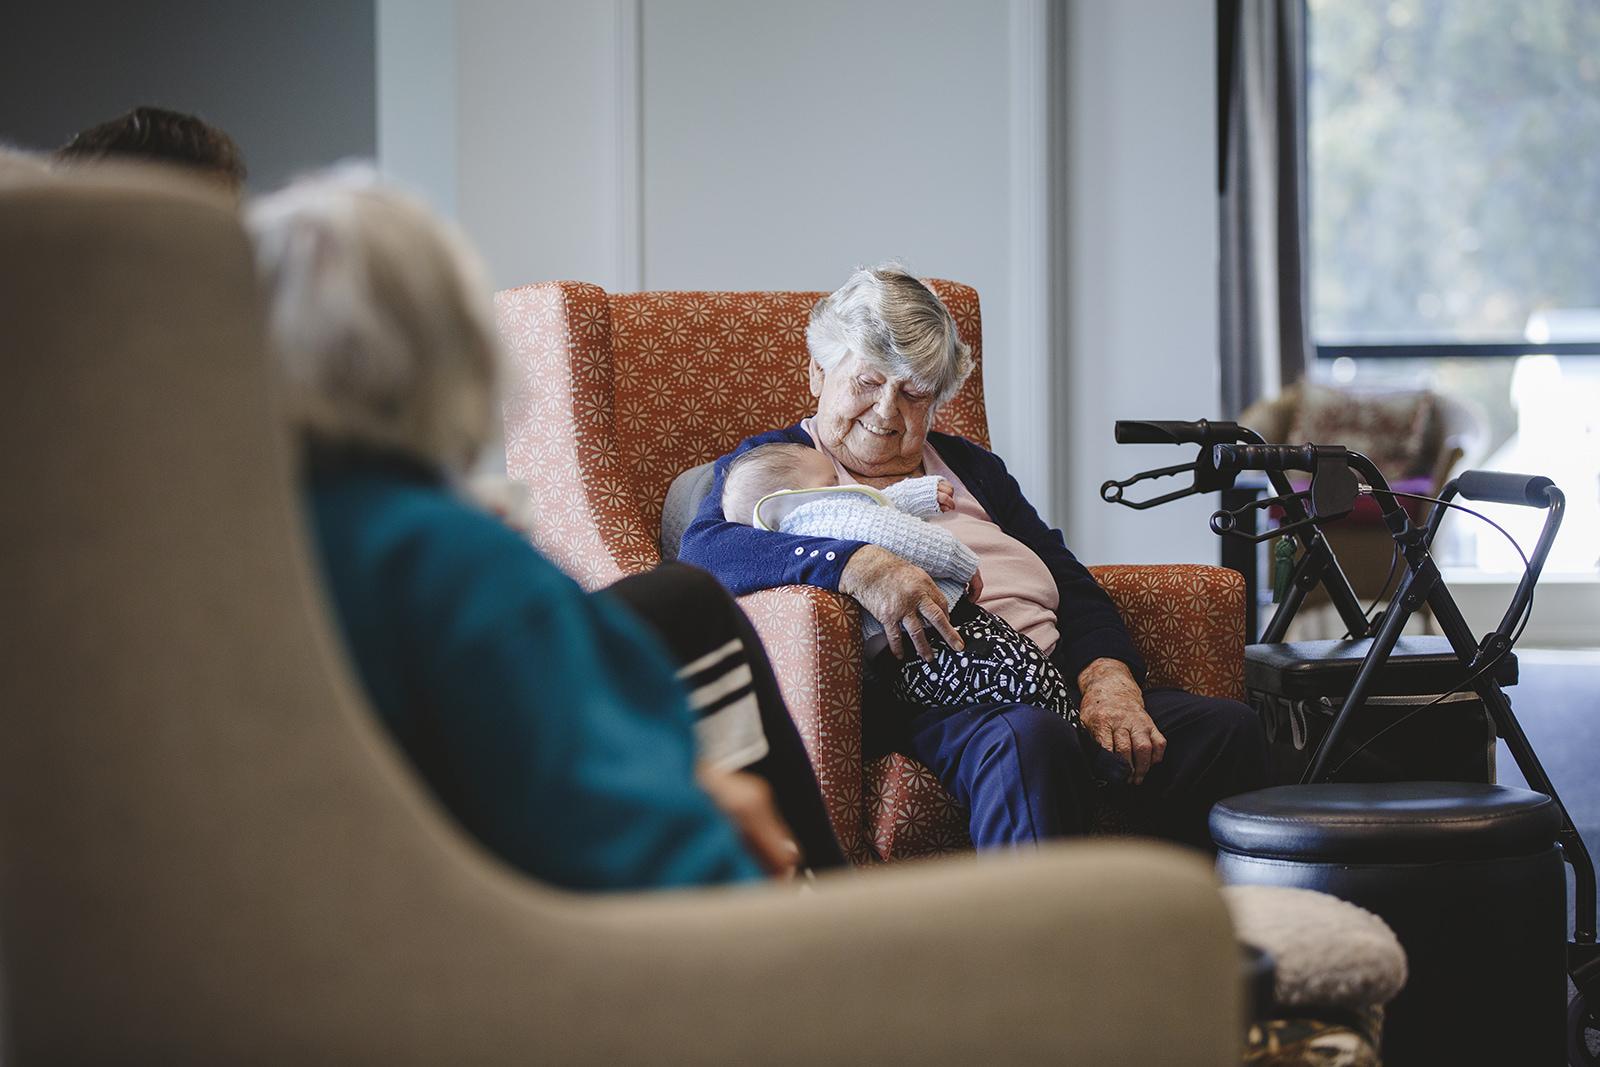 Act-of-Kindness-Elderly-Rest-Home-Visits-56.jpg